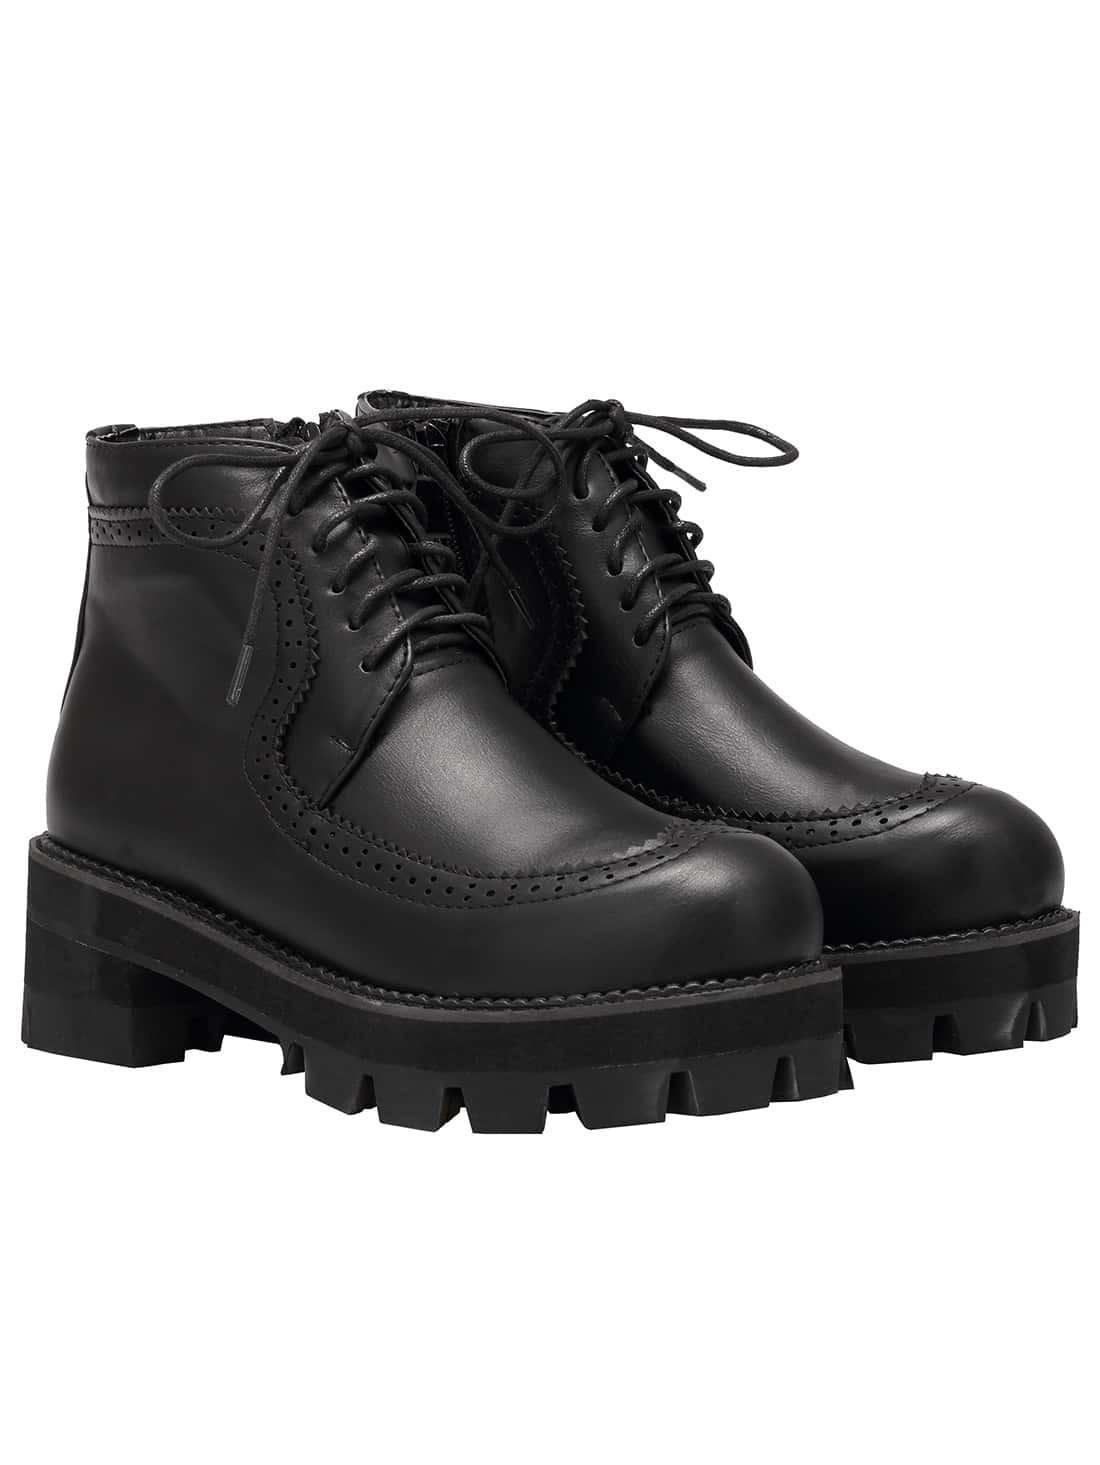 Black Round Toe Lace Up PU Boots